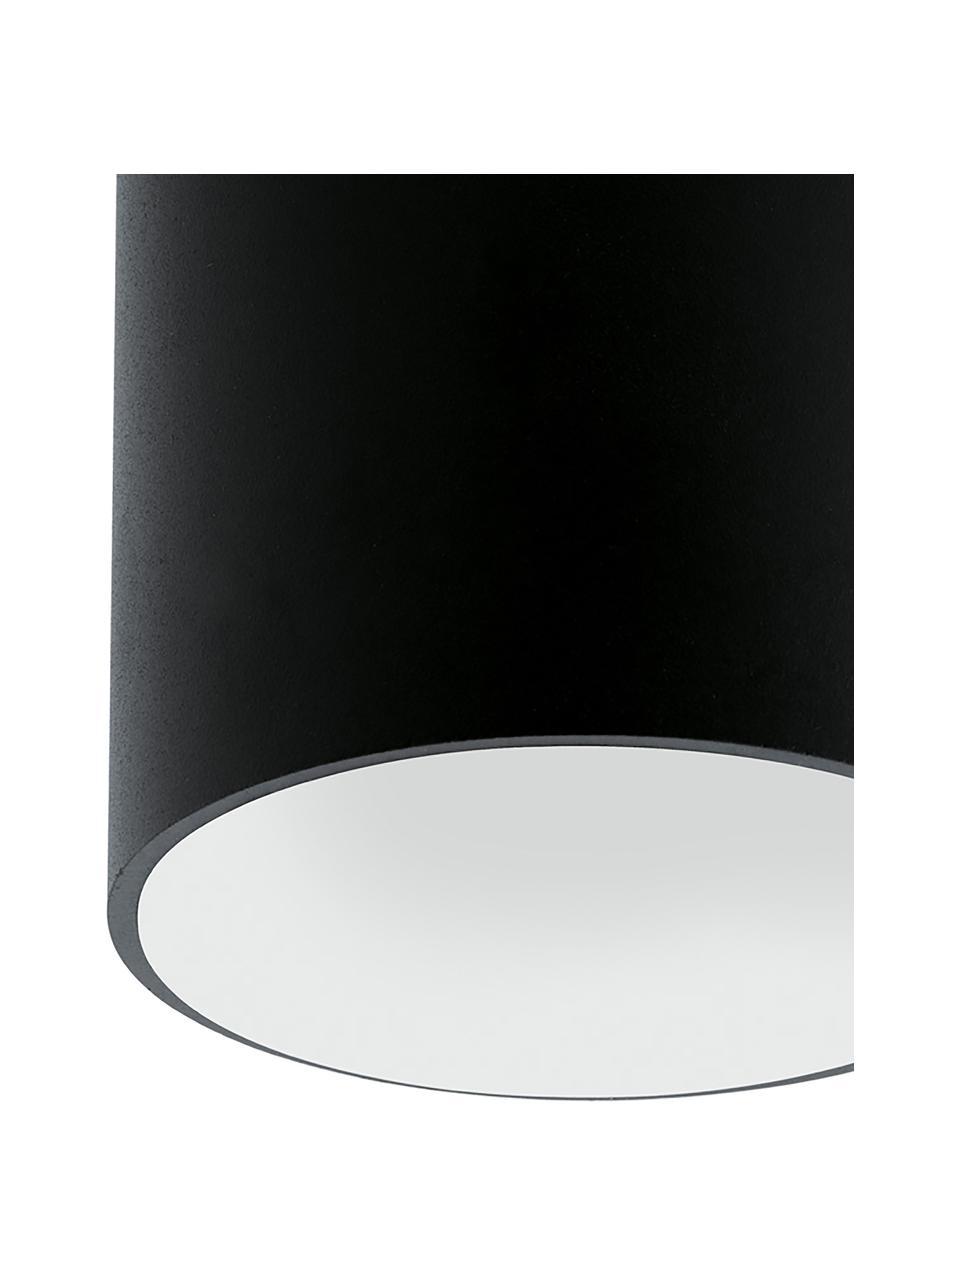 LED-Deckenspot Marty, Lampenschirm: Metall, pulverbeschichtet, Schwarz,Weiß, Ø 10 x H 12 cm